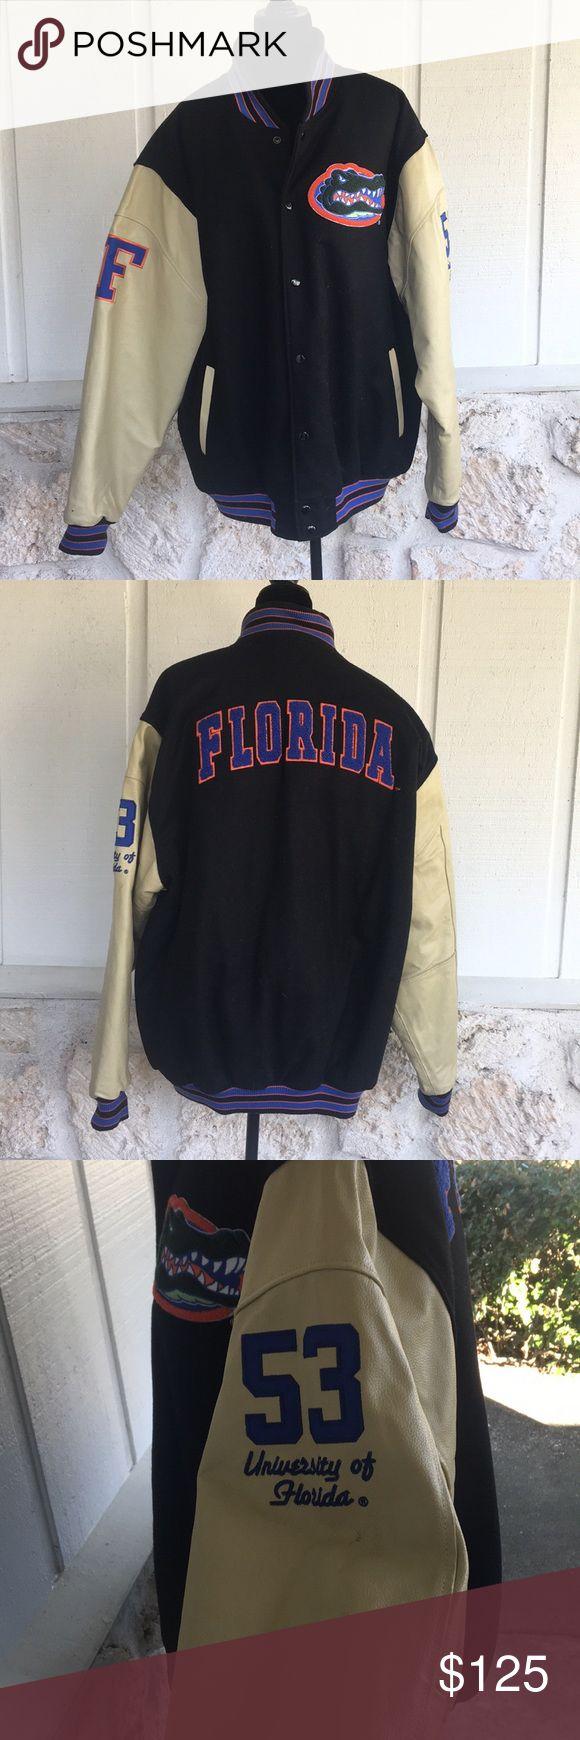 🆕Florida Gators Men's varsity coat ✅I ship same or next day ✅Bundle for discount Colosseum Jackets & Coats Bomber & Varsity